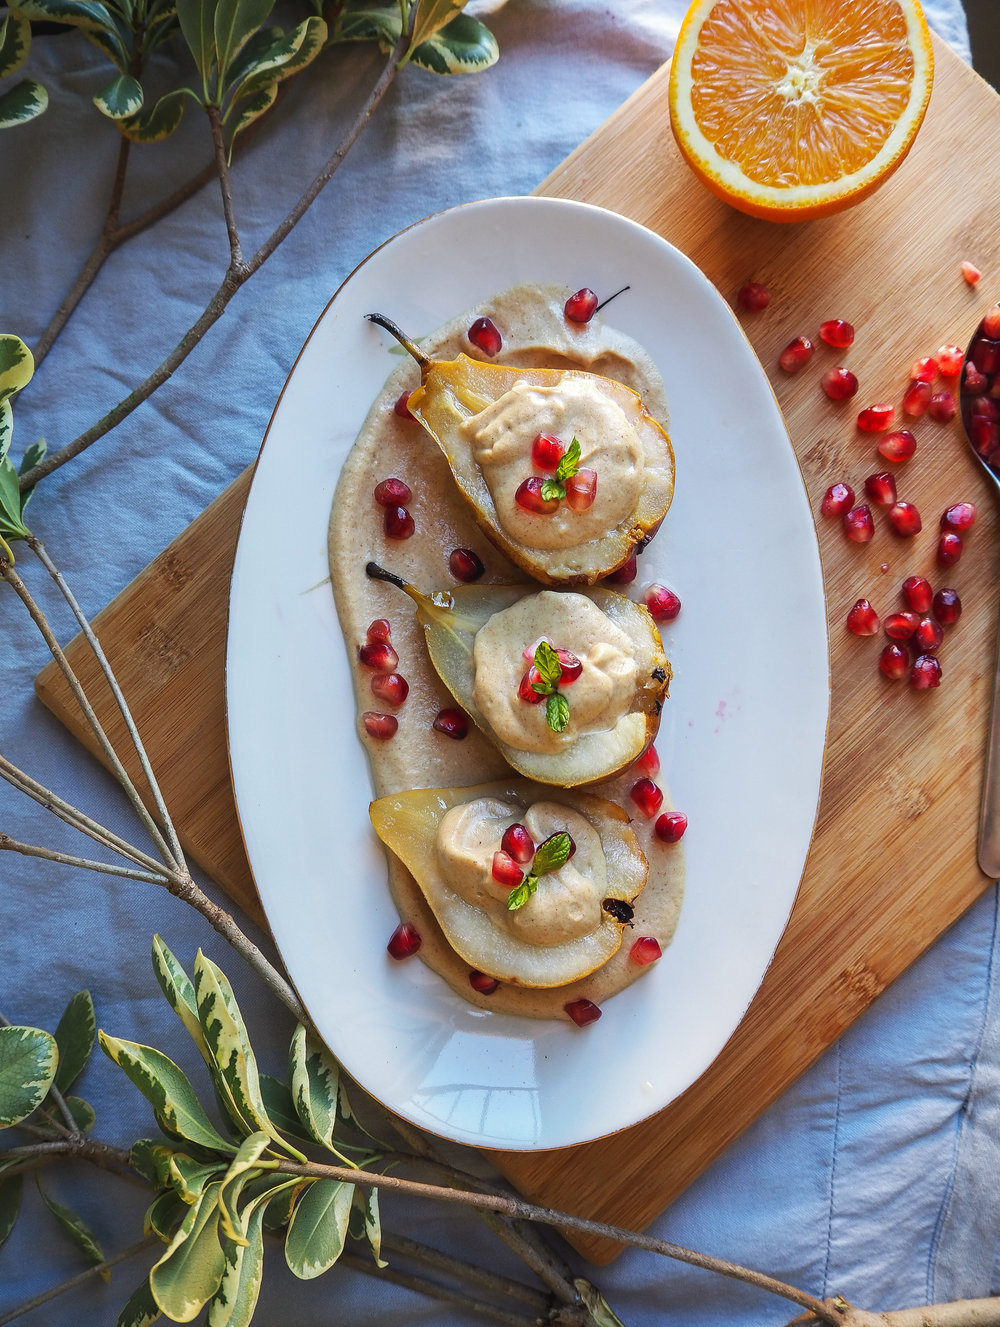 Roasted Pear with Ginger Orange Cashew Cream | Healthy Plant-Based Vegan Dessert, Oil-Free  Photo by Elena Hollenhorst